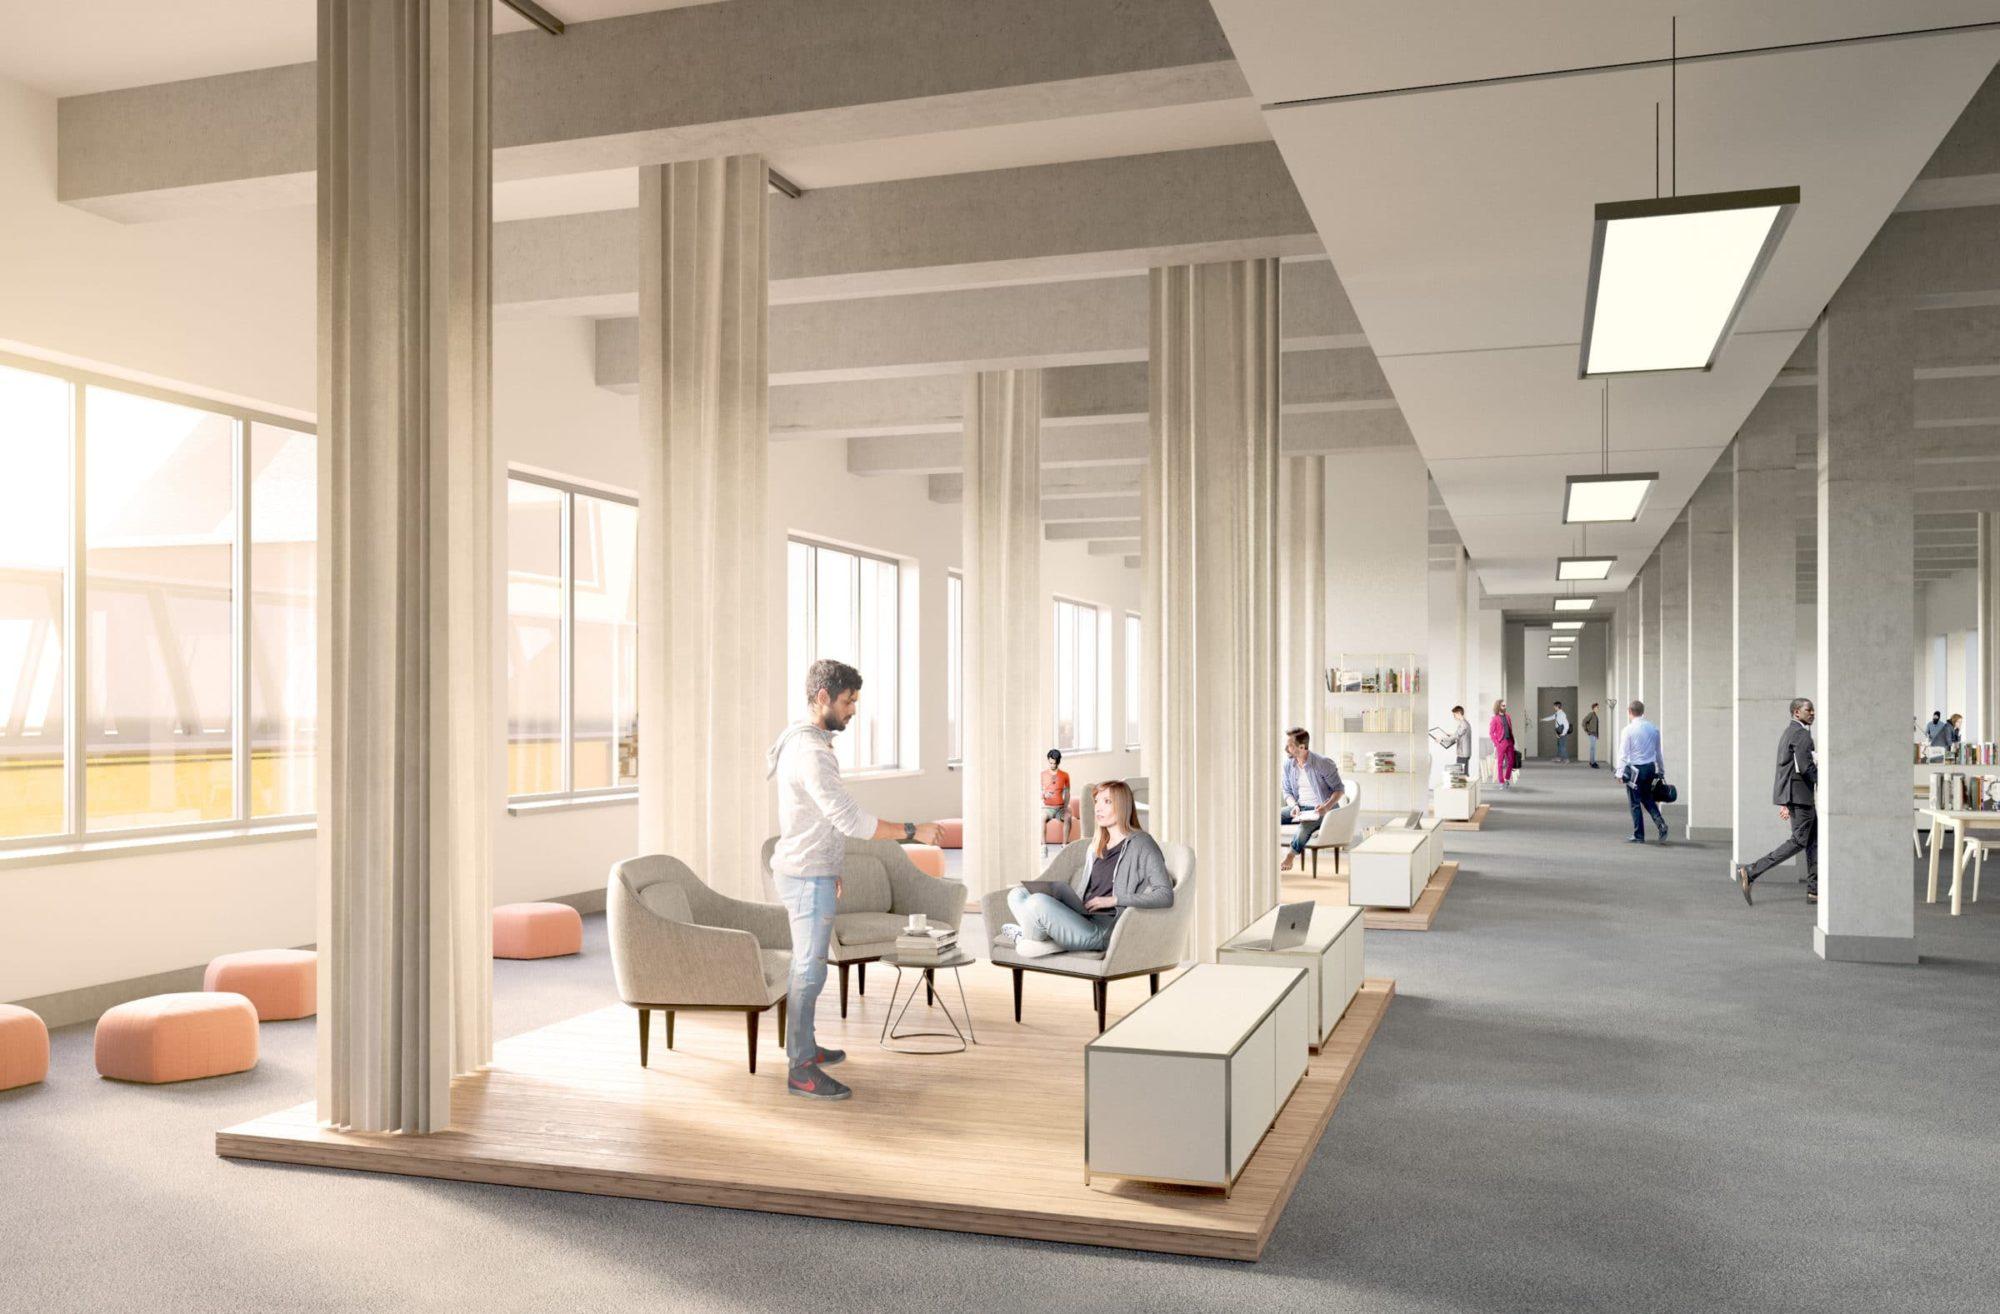 Haus des Wissens - Open Office